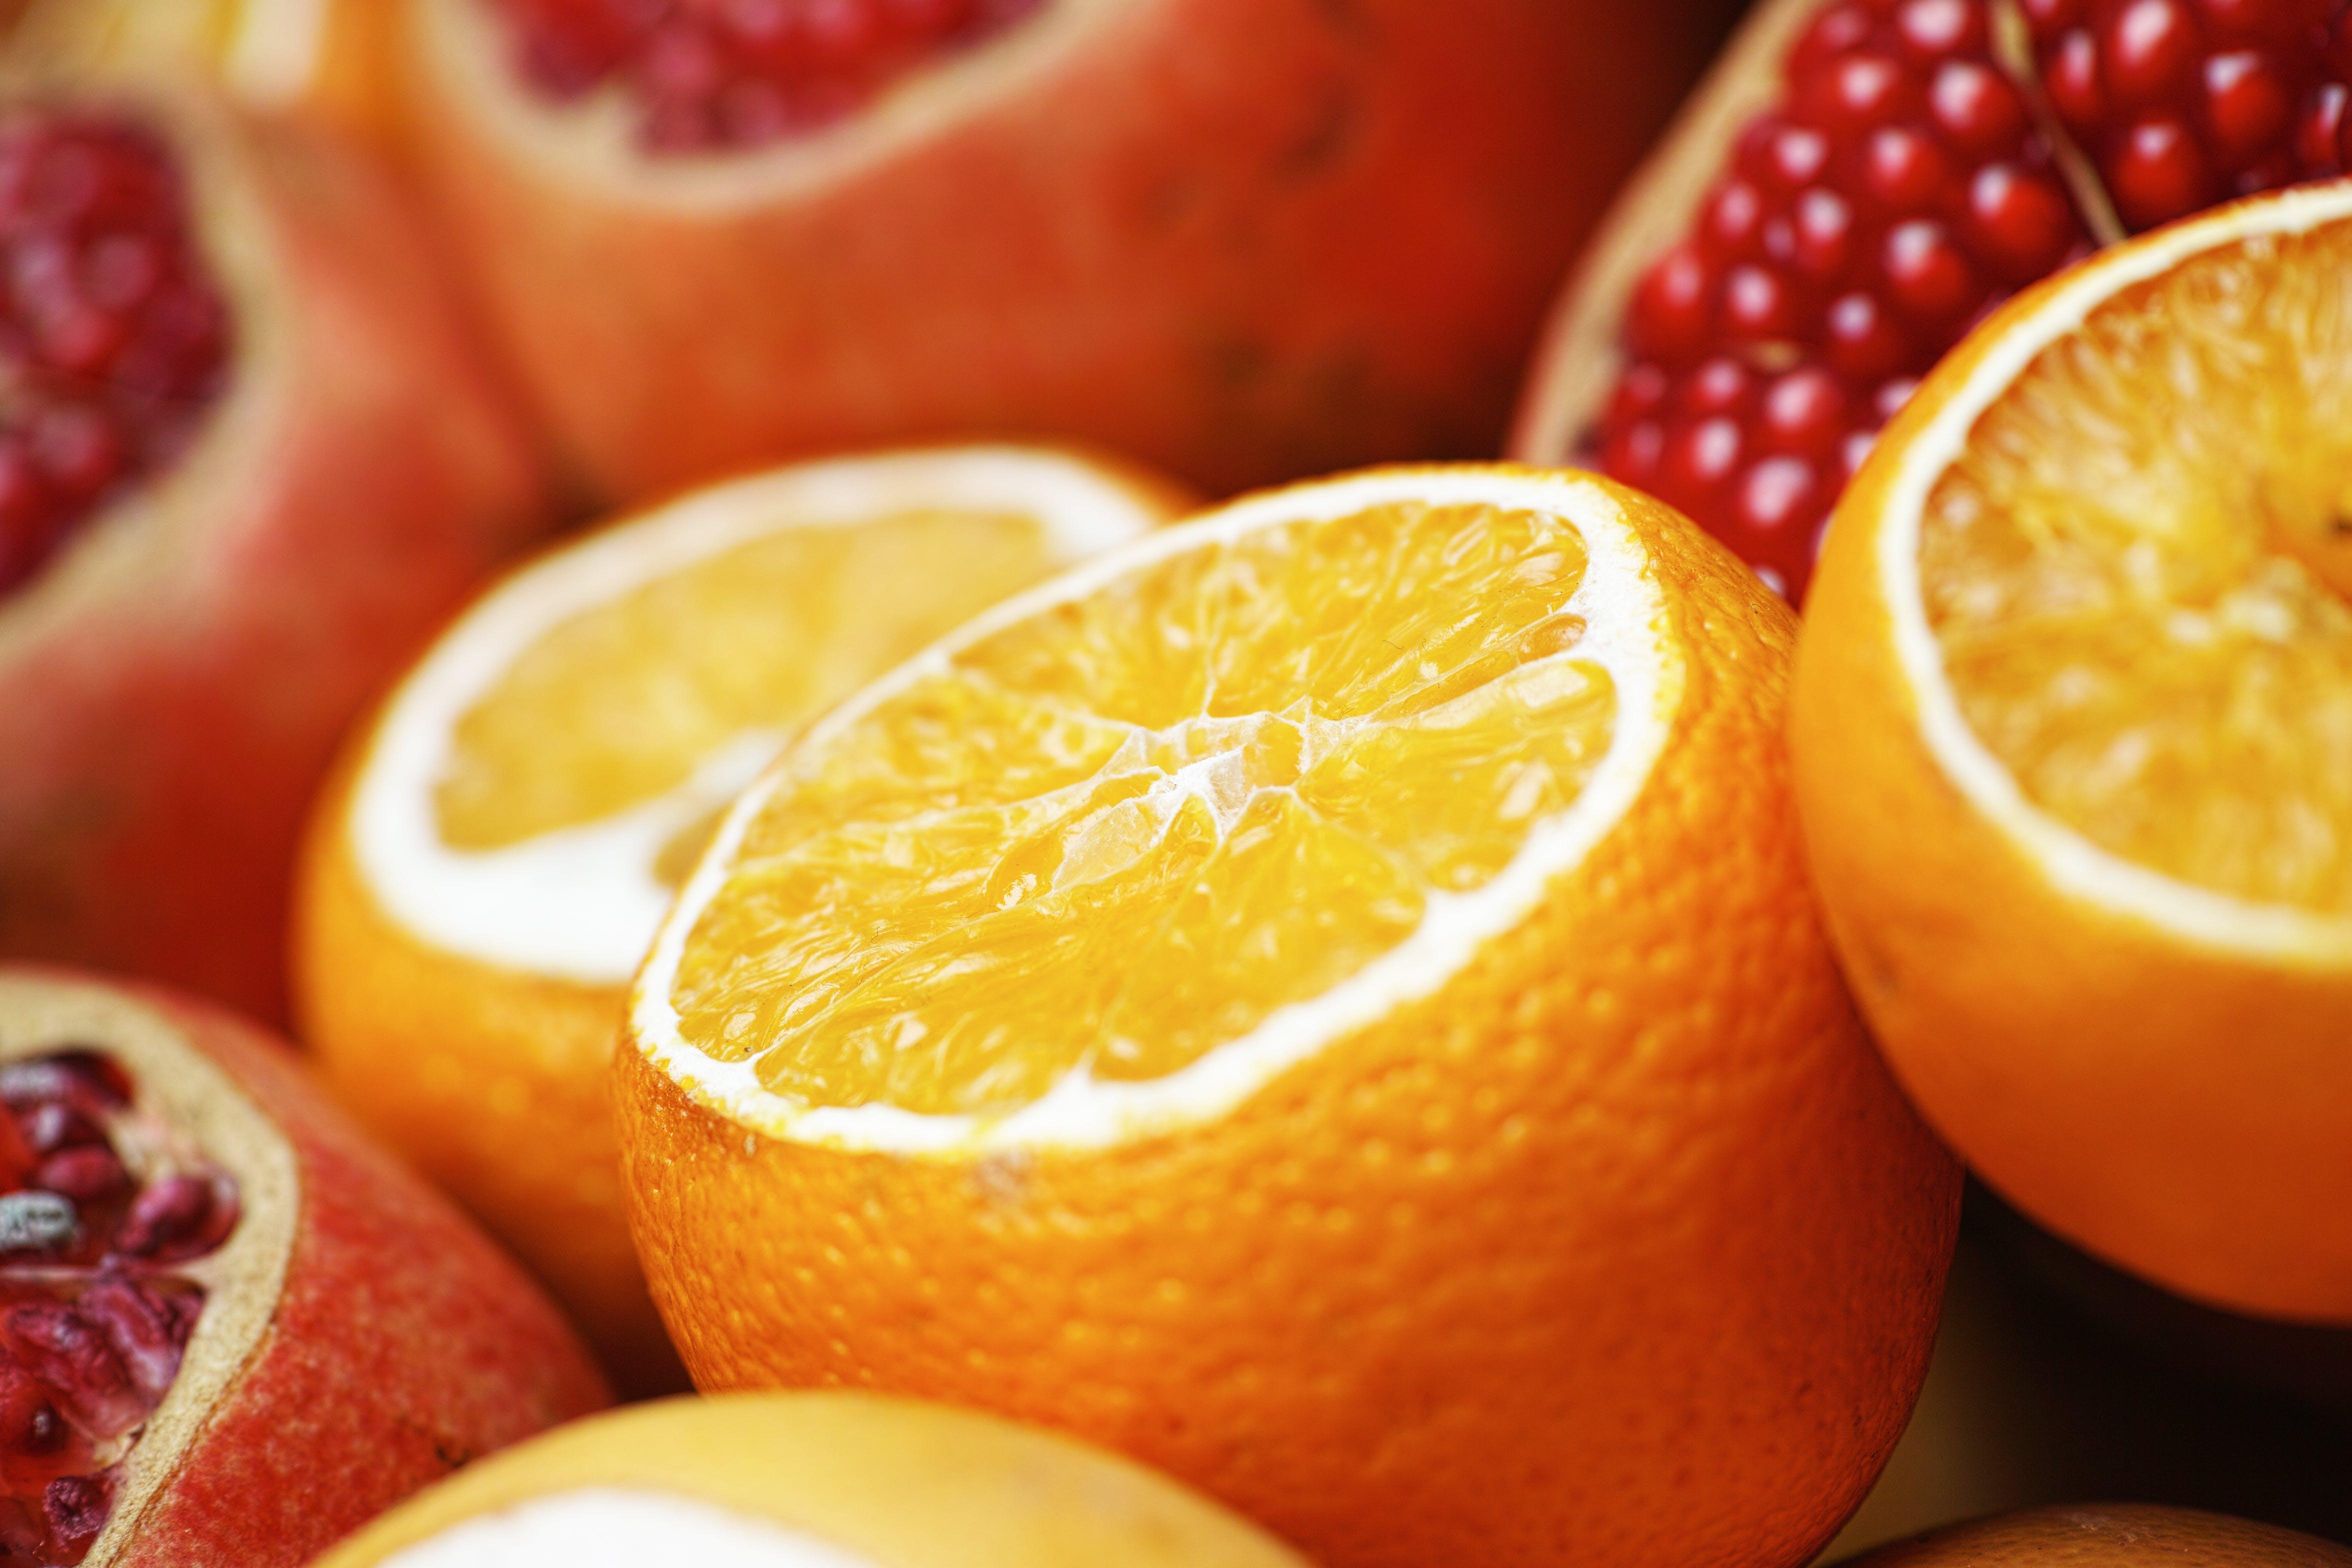 Close-up Photo of Sliced Orange and Grapefruit Fruits